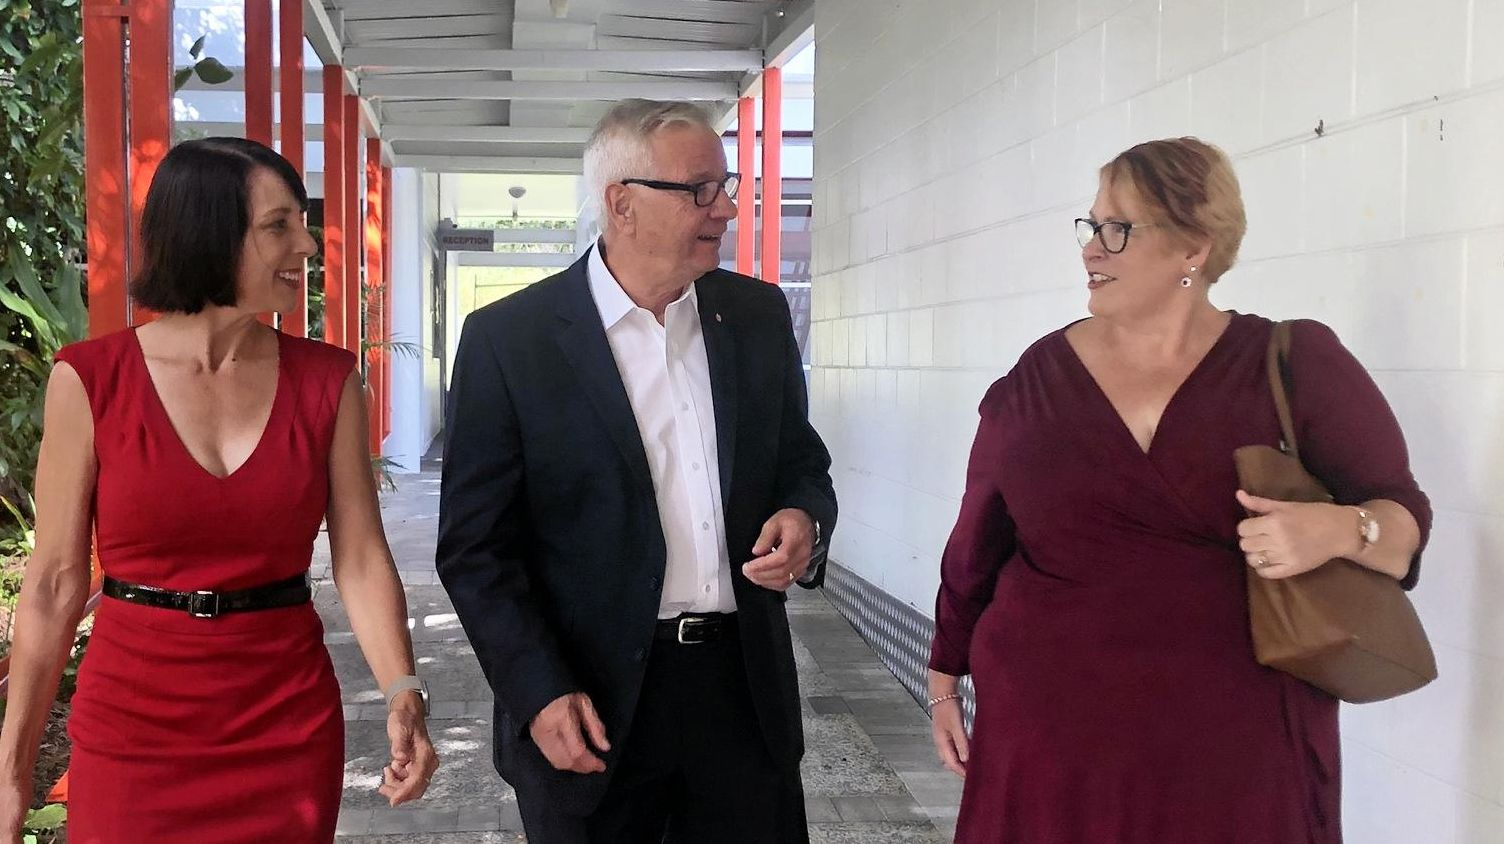 Labor candidate for Dawson, Belinda Hassan and Senator Doug Cameron visit TAFE Queensland's Cannonvale campus with TAFE Queensland executive director Susan Kinobe.